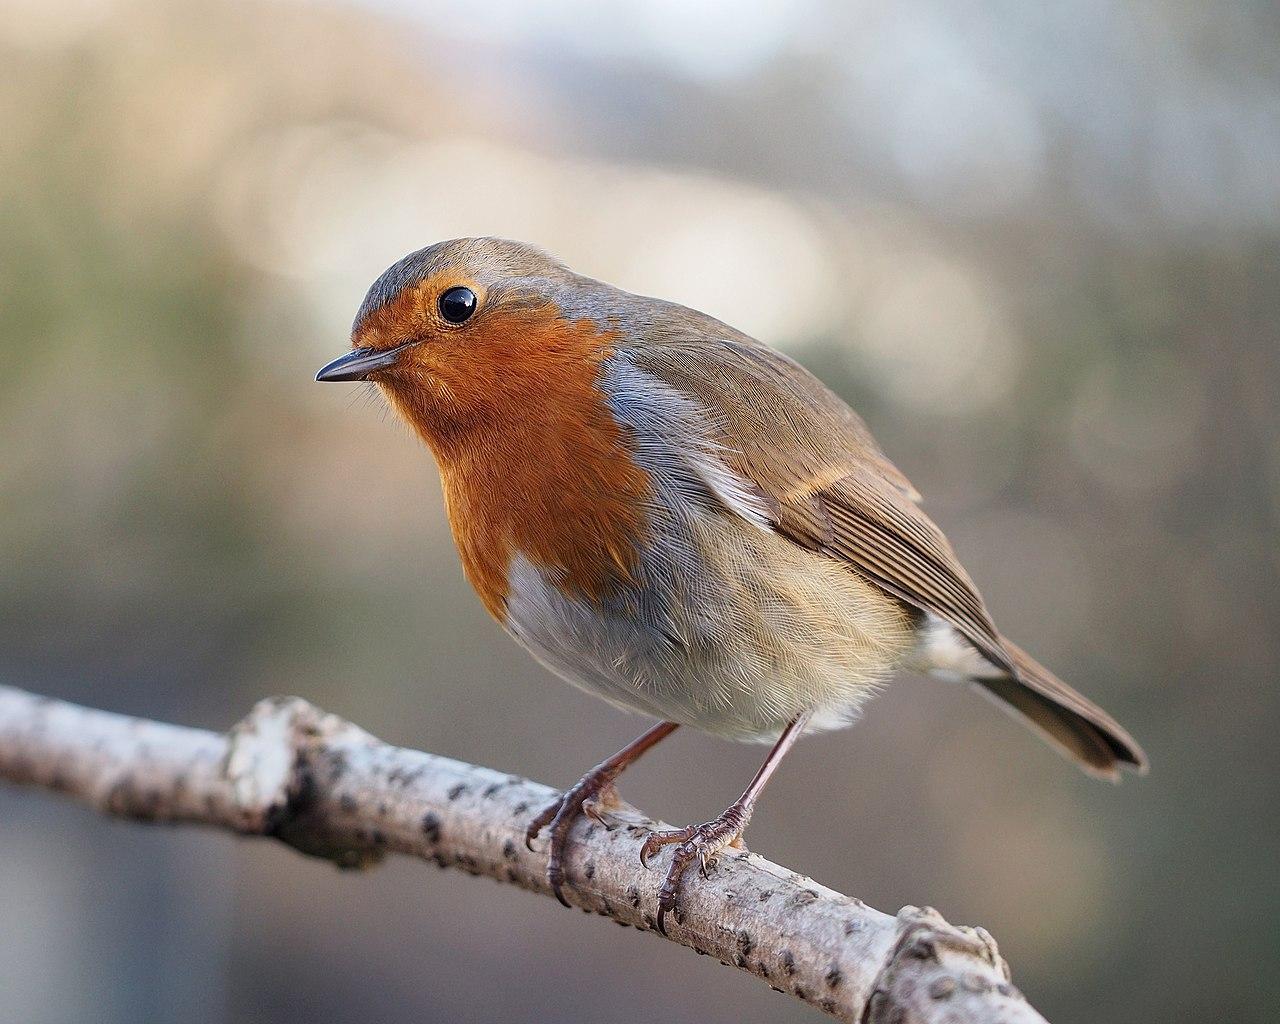 Same name, different bird